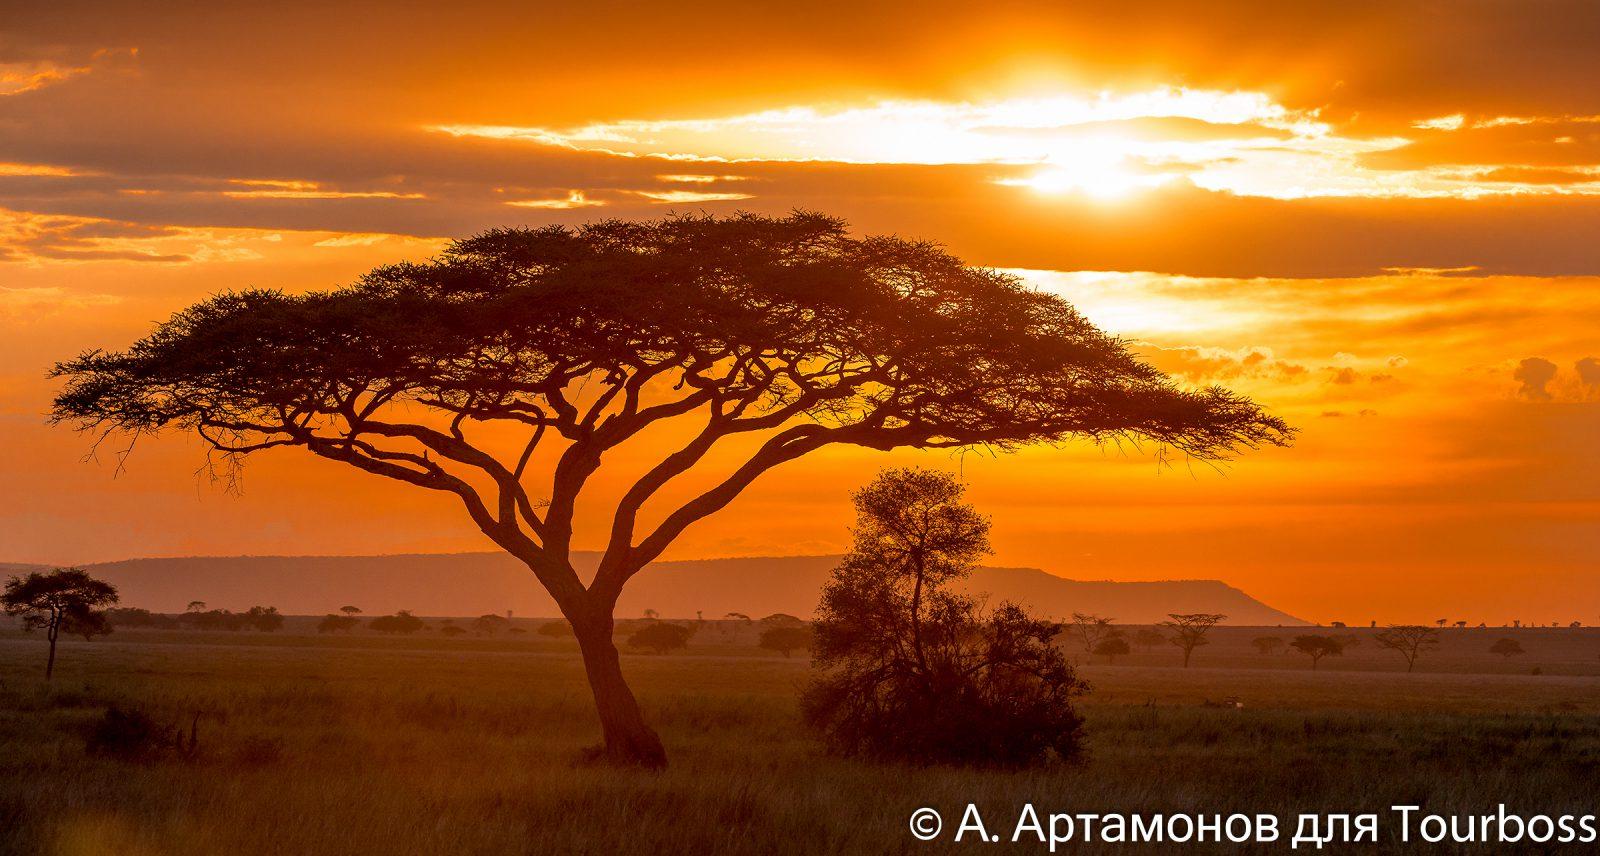 Туры в Танзанию, сафари в Танзании, отдых в Танзании, индивидуальные туры в Танзанию, групповые туры в Танзанию